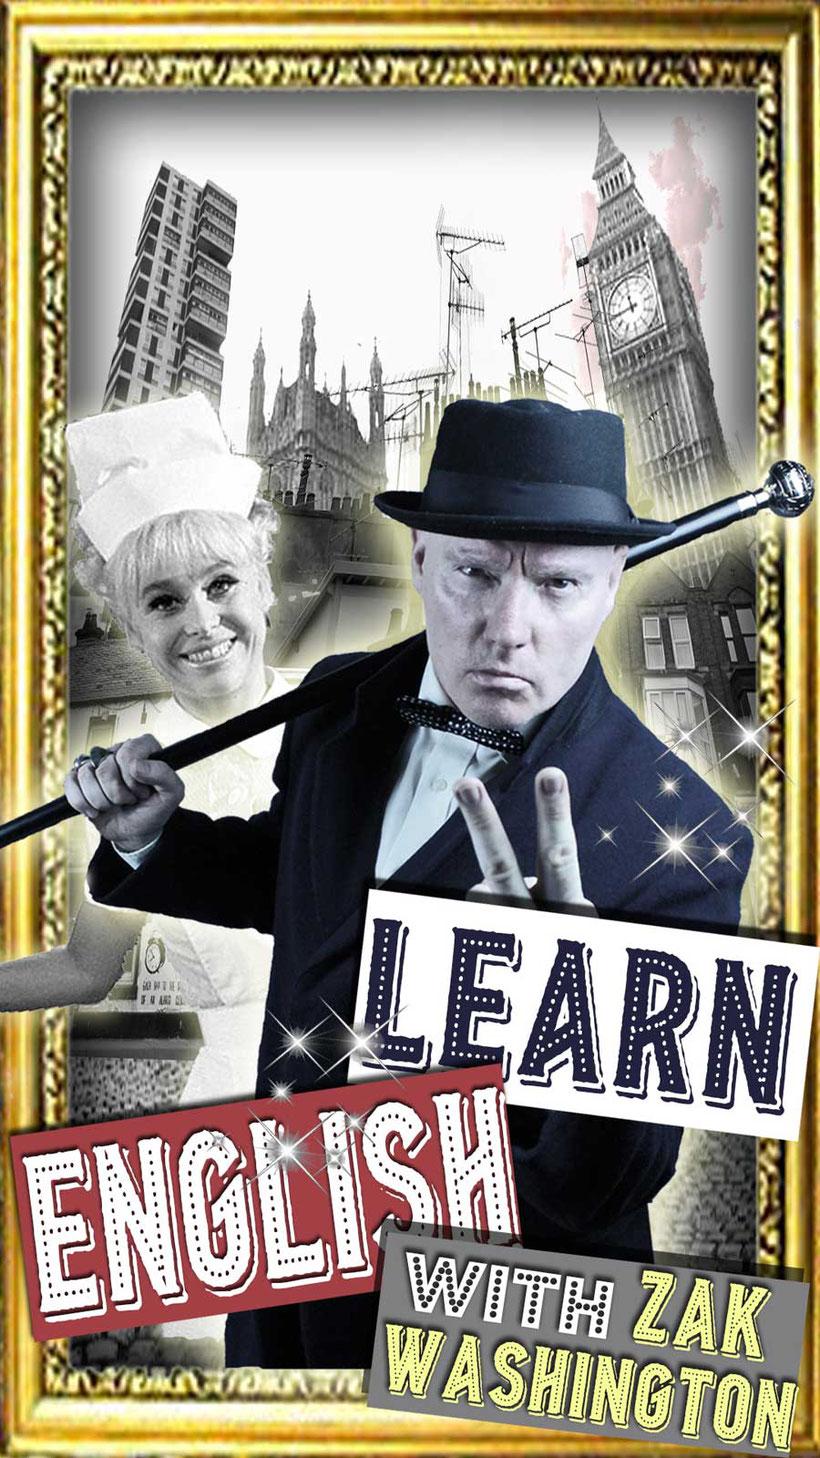 Learn English with Zak Washington London skyline graphic with Barbara Windsor. By Language Unlimited